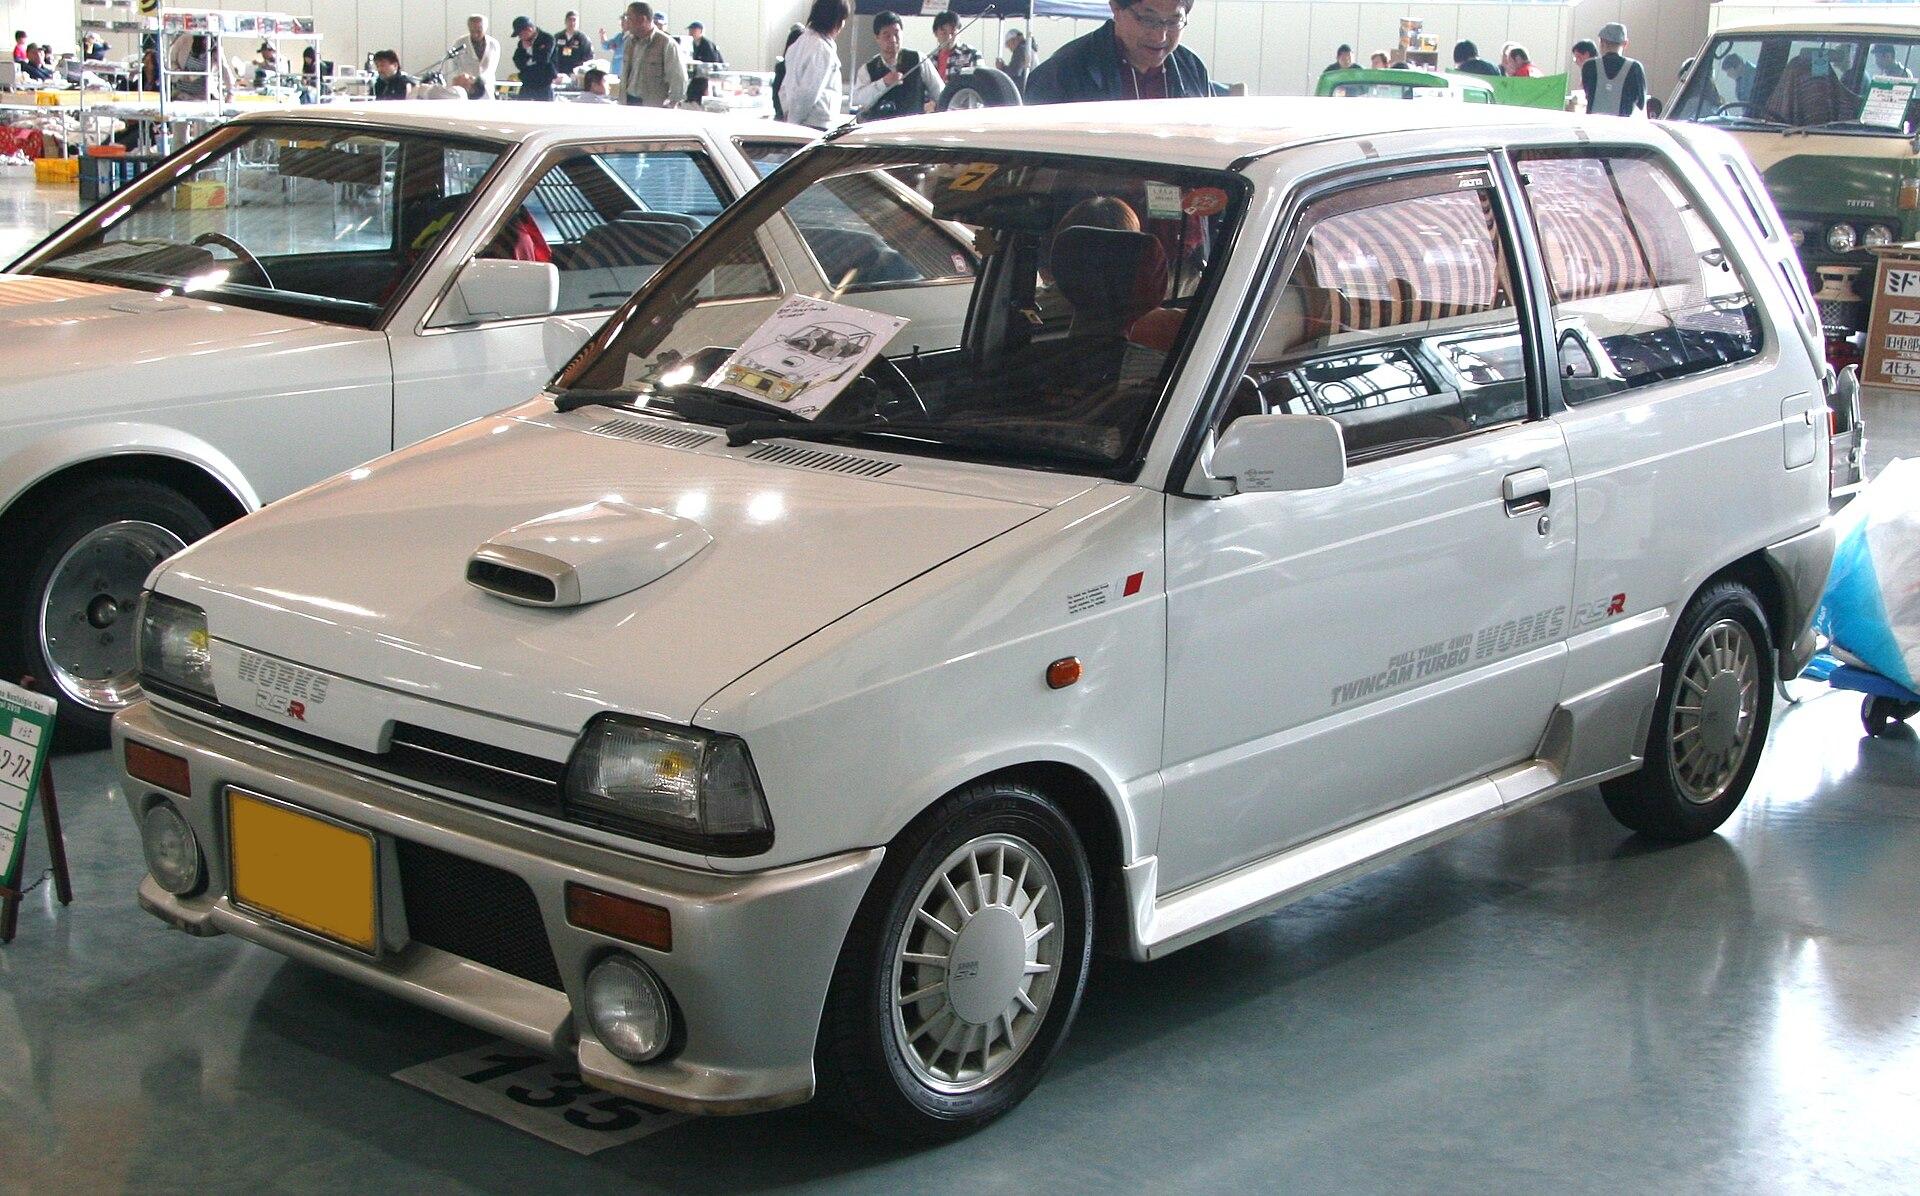 Suzuki alto works rs r cc72 rare cars from japan pinterest suzuki alto kei car and cars